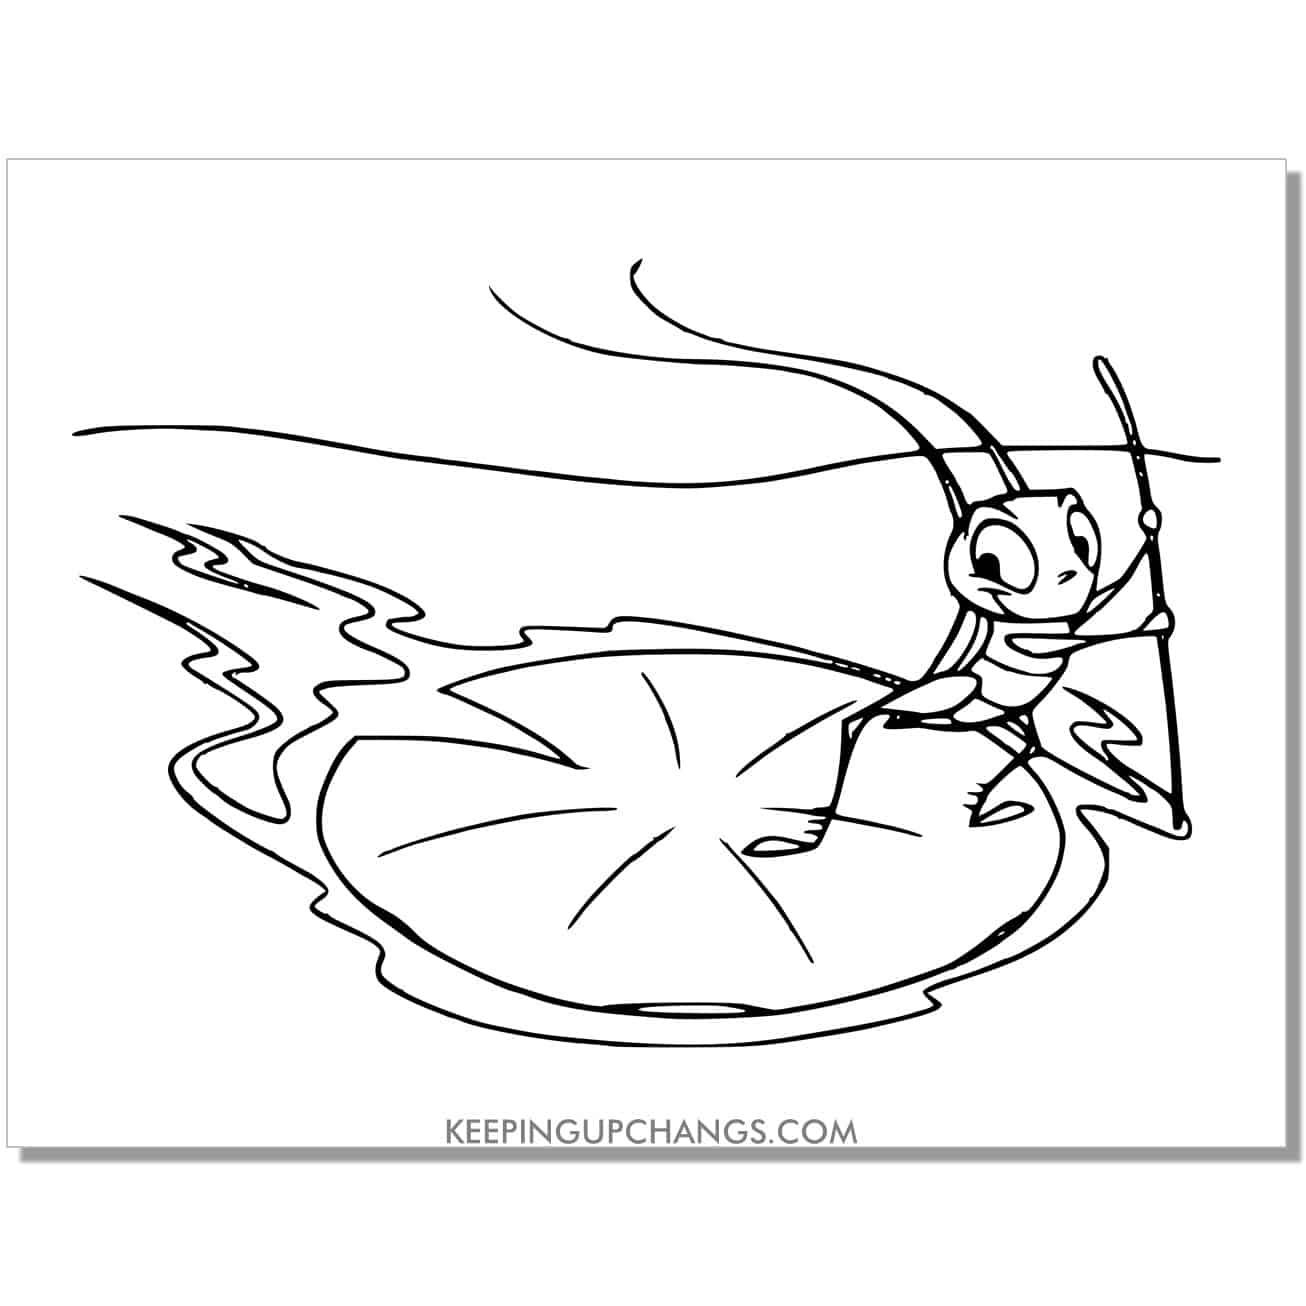 mulan cricket cri kee floating on lilypad coloring page.